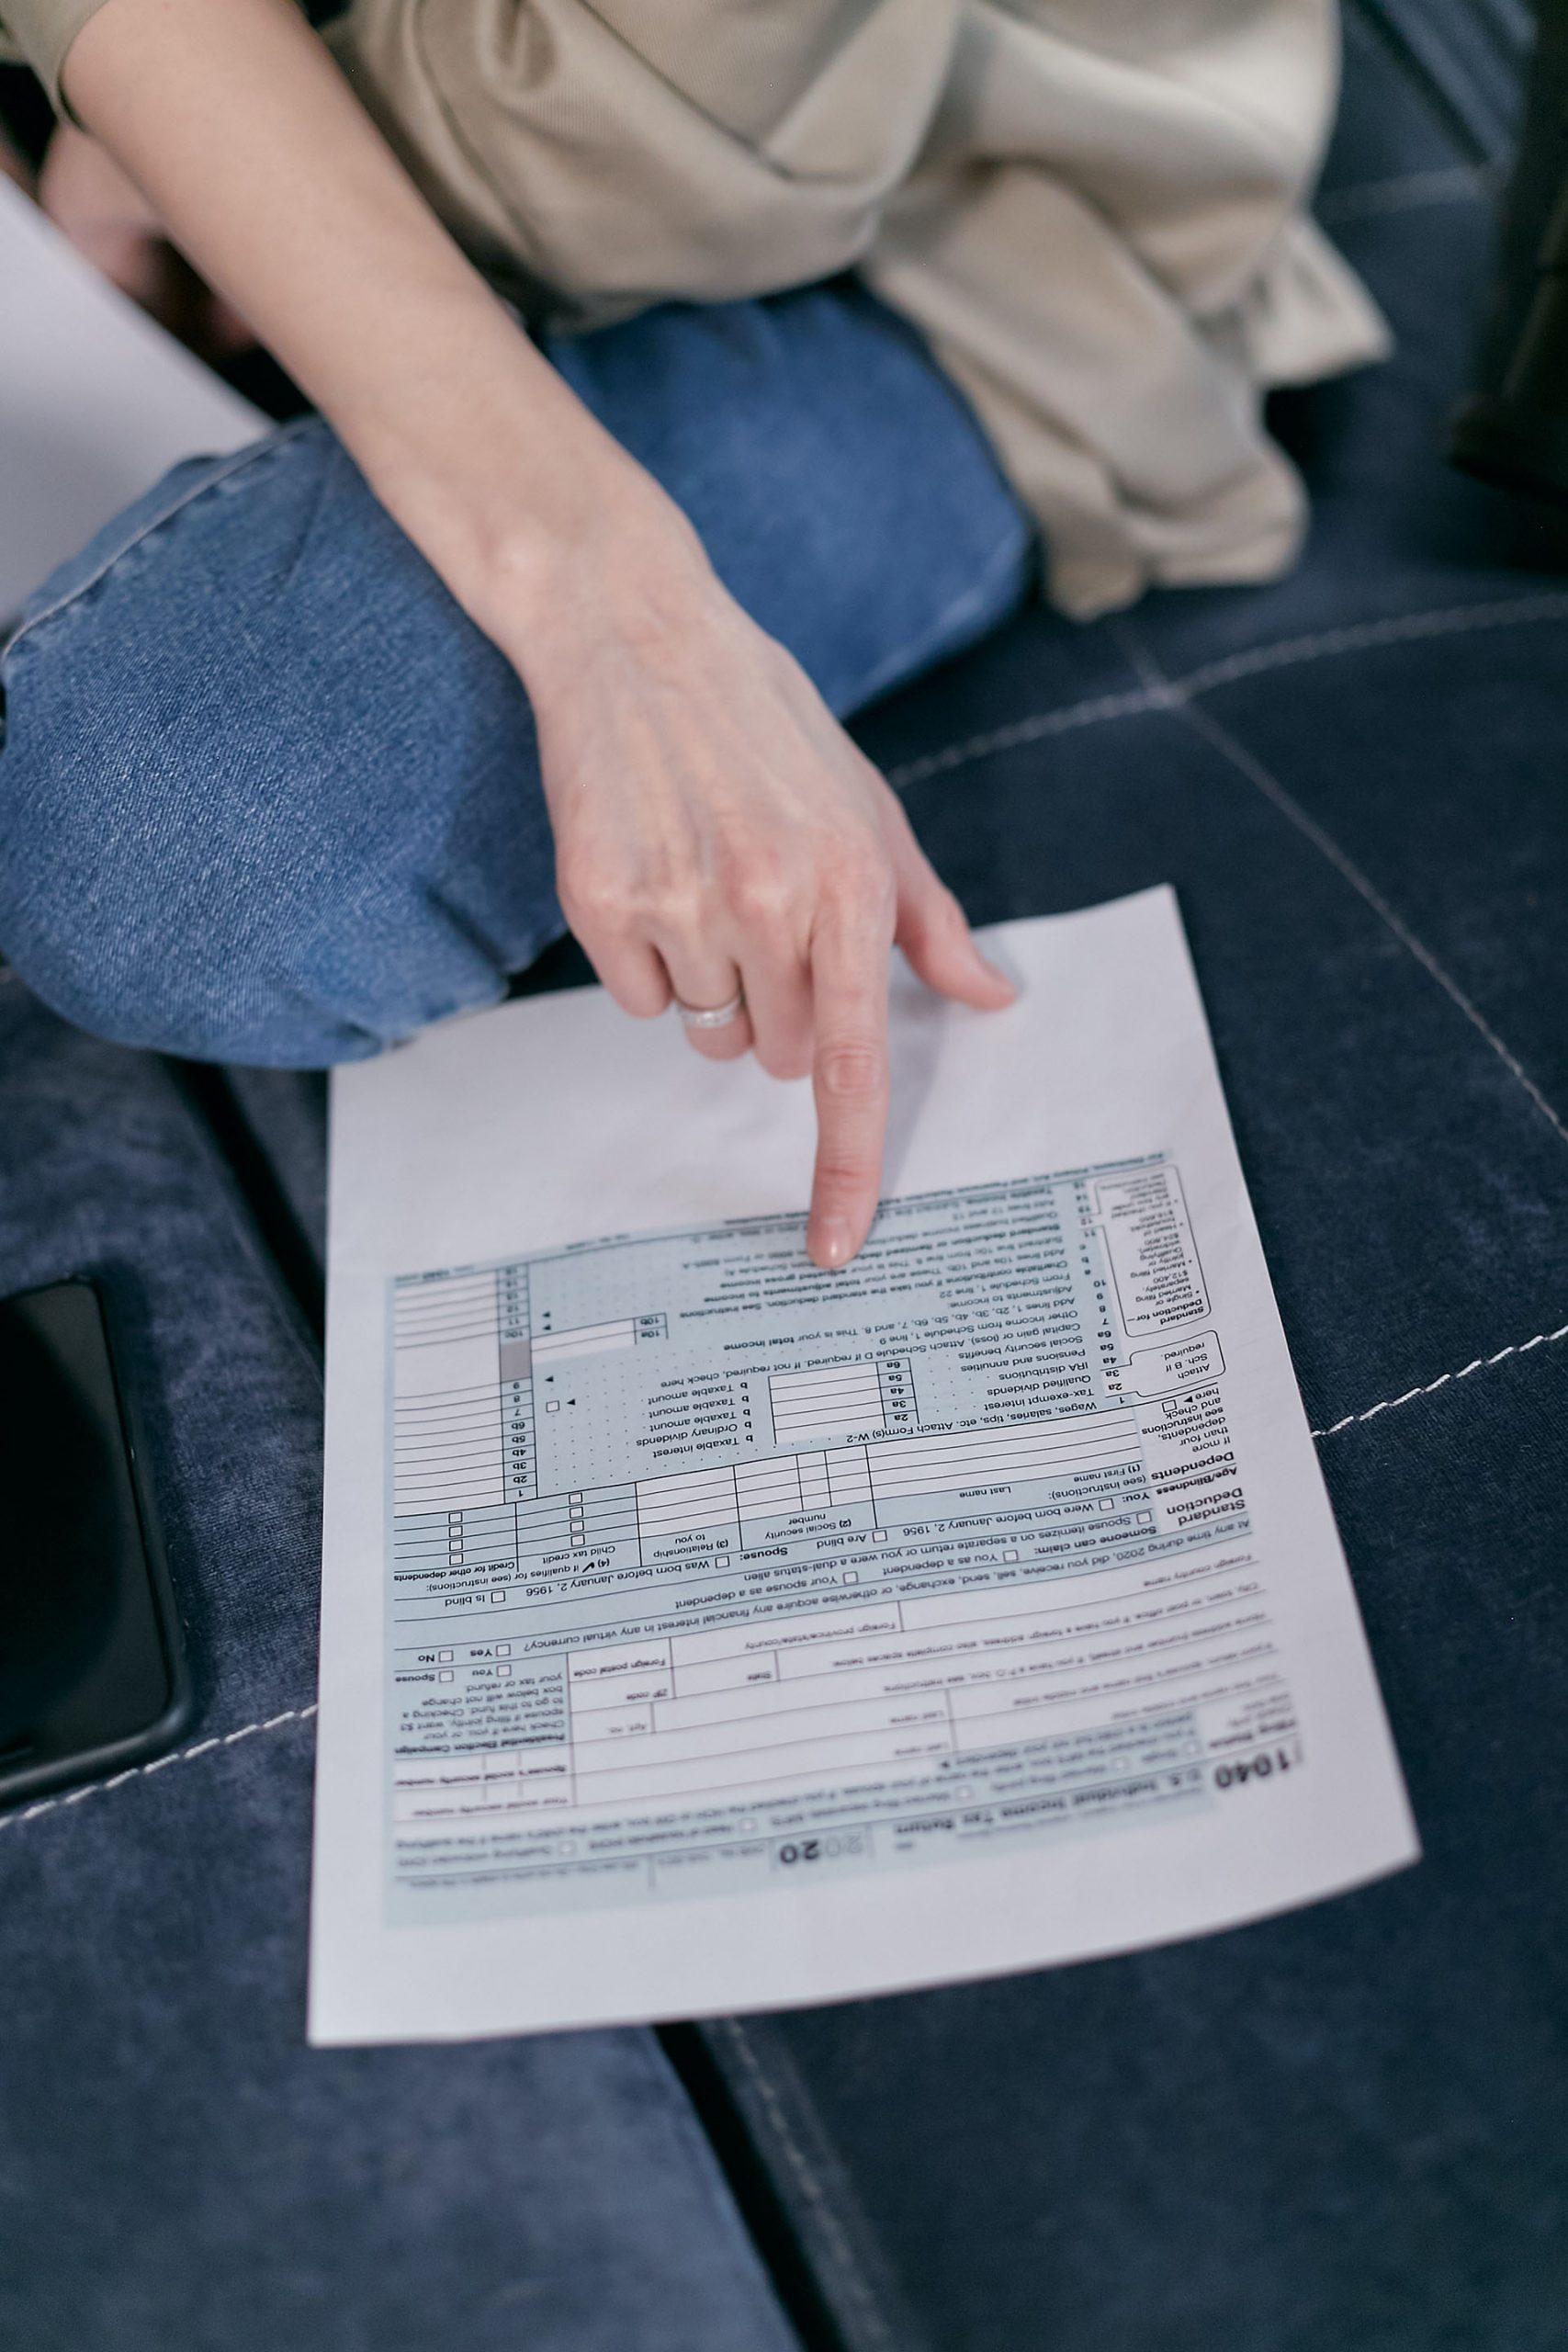 Boletim OA - discutir - Risco de insolvência ©Mikhail Nilov - Pexels